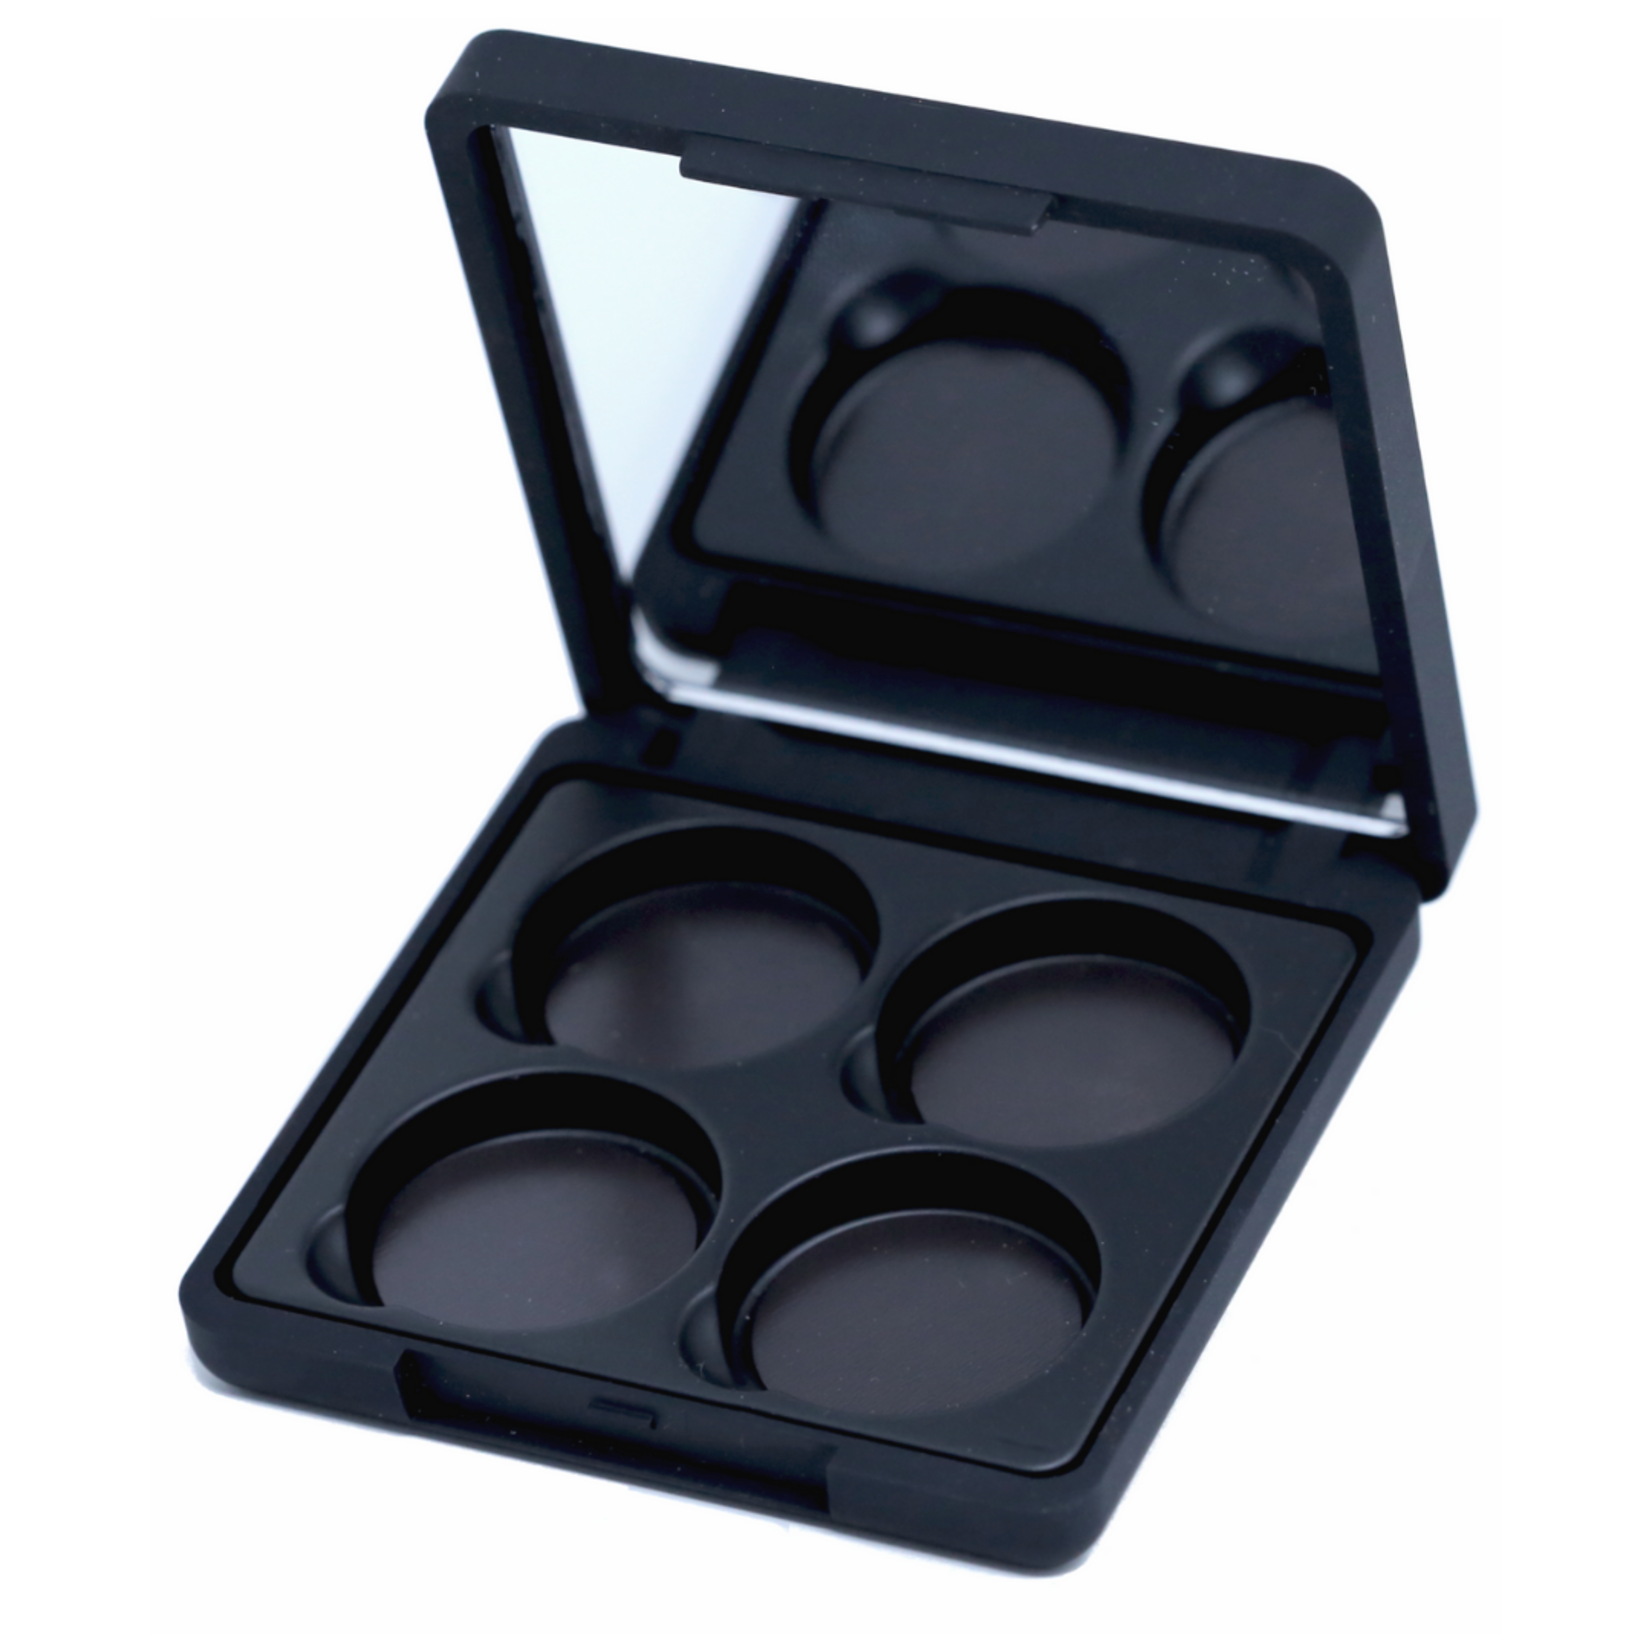 JKC 4-well Eyeshadow Compact